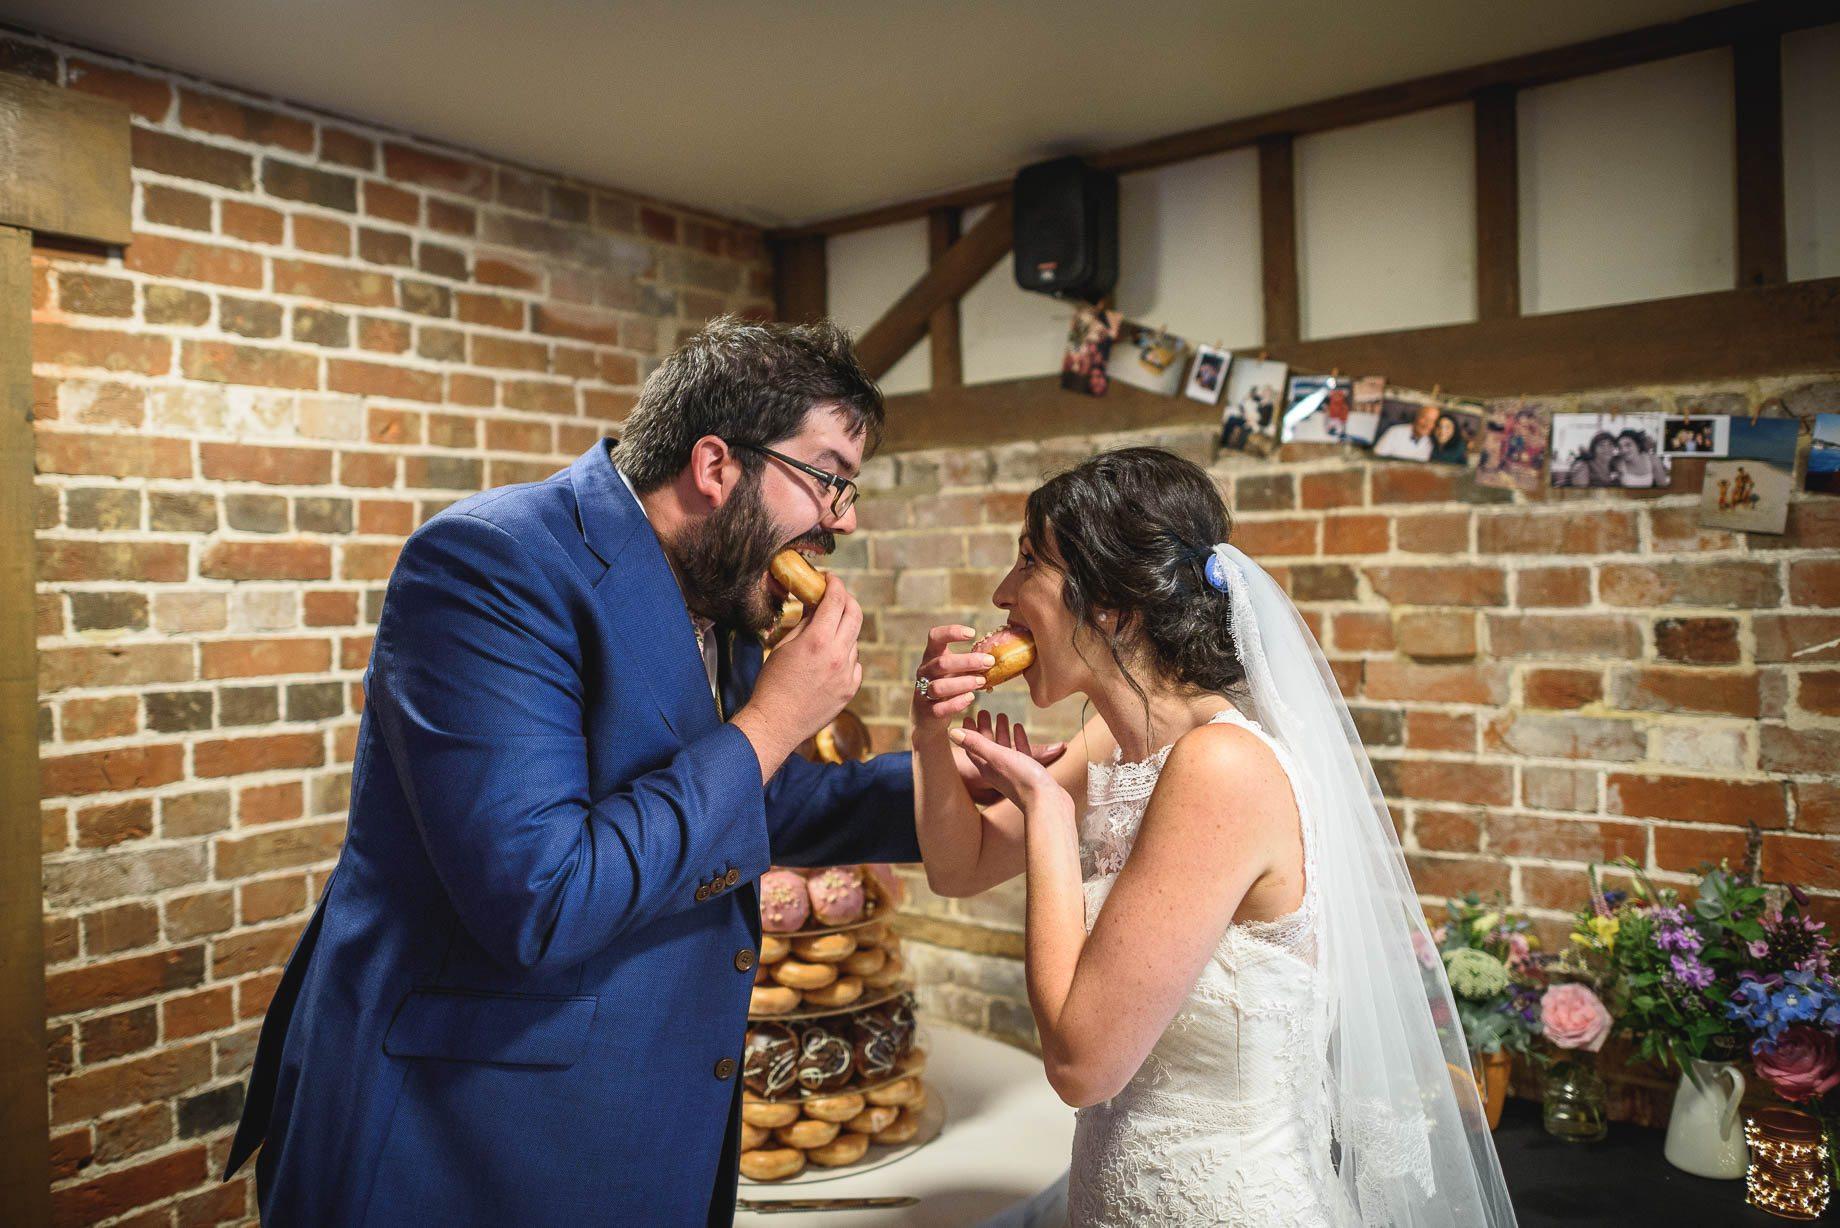 Gaynes Park wedding photography - Guy Collier Photography - Rachel and Jon (159 of 169)